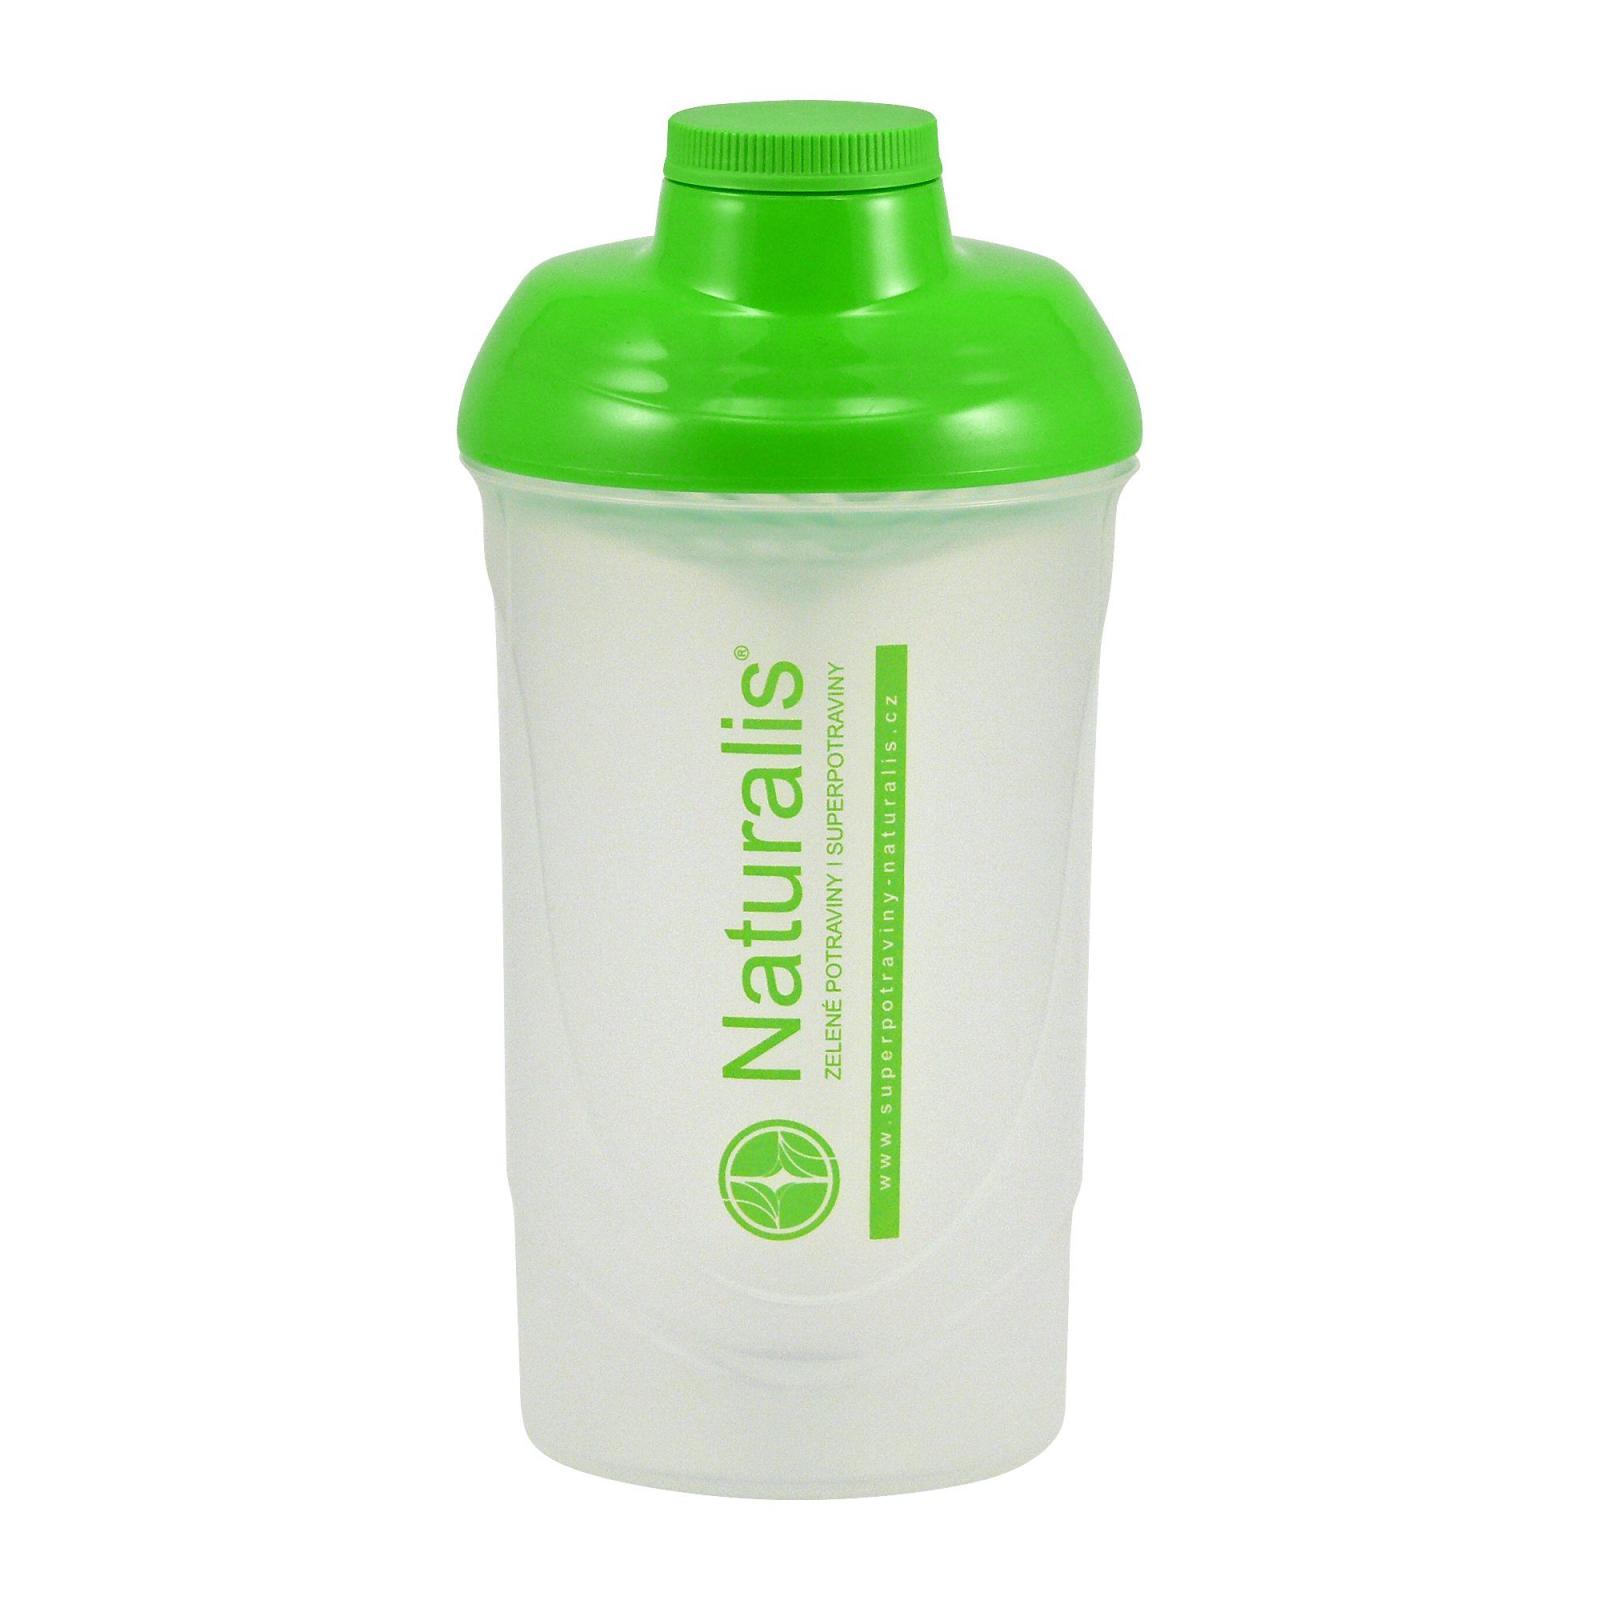 Naturalis Šejkr 600 ml, plast